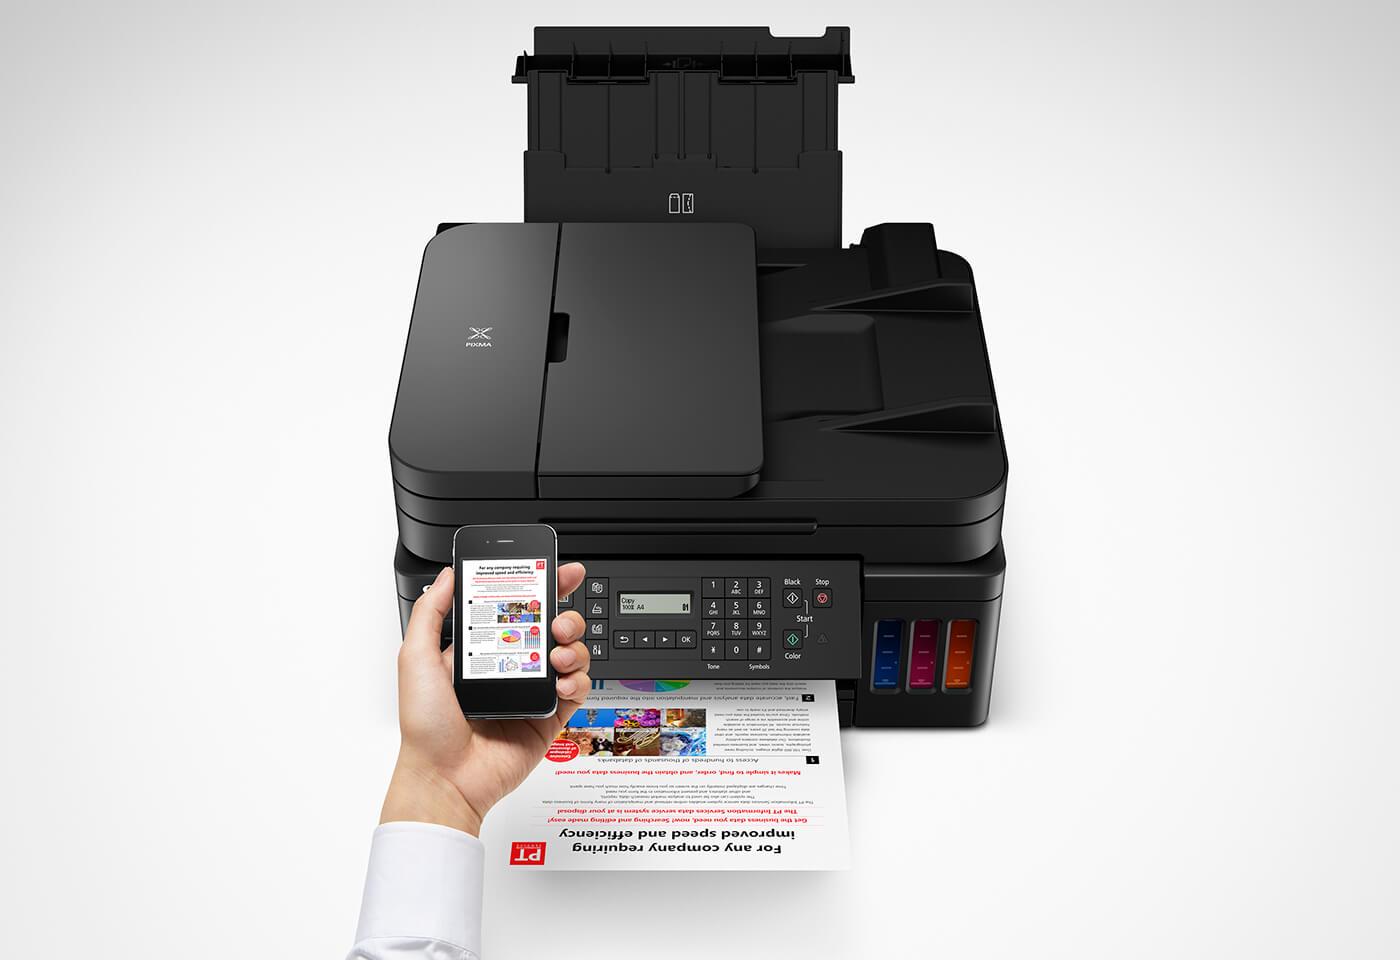 PIXMA Endurance G7060 G7065 wireless printing